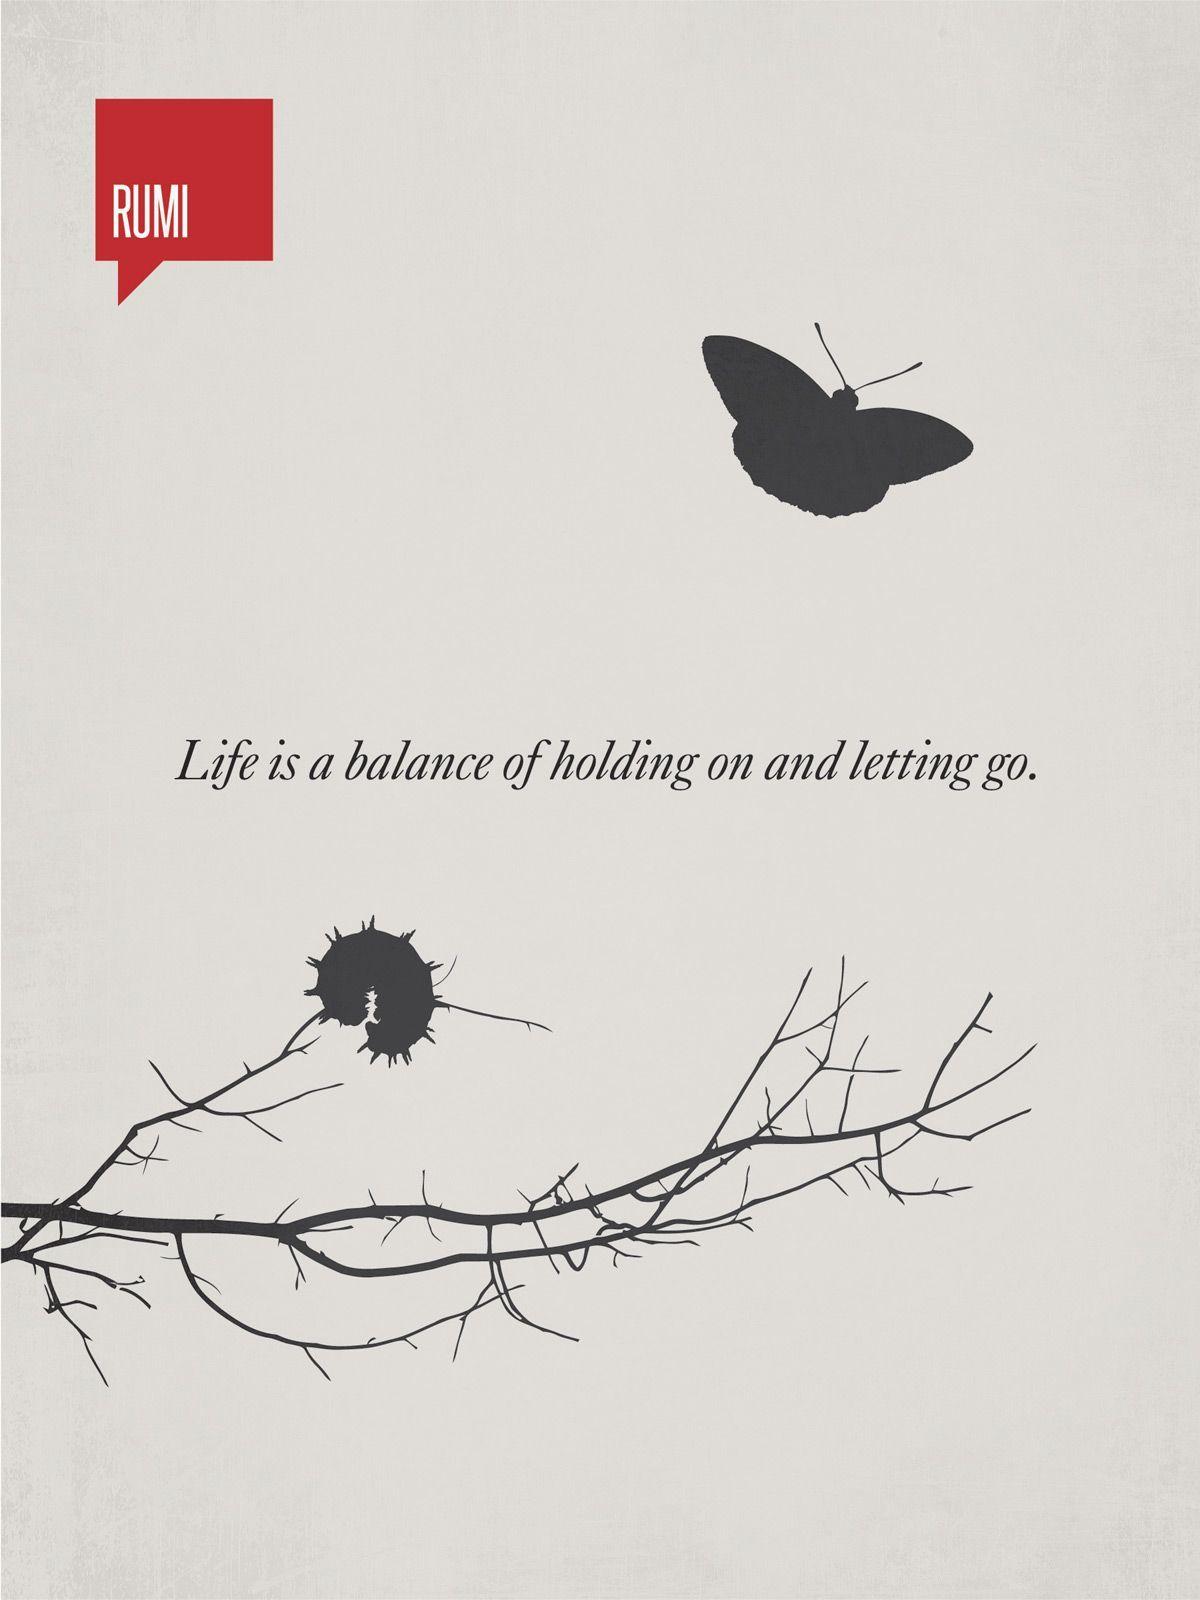 Minimalist Poster Quote Rumi: